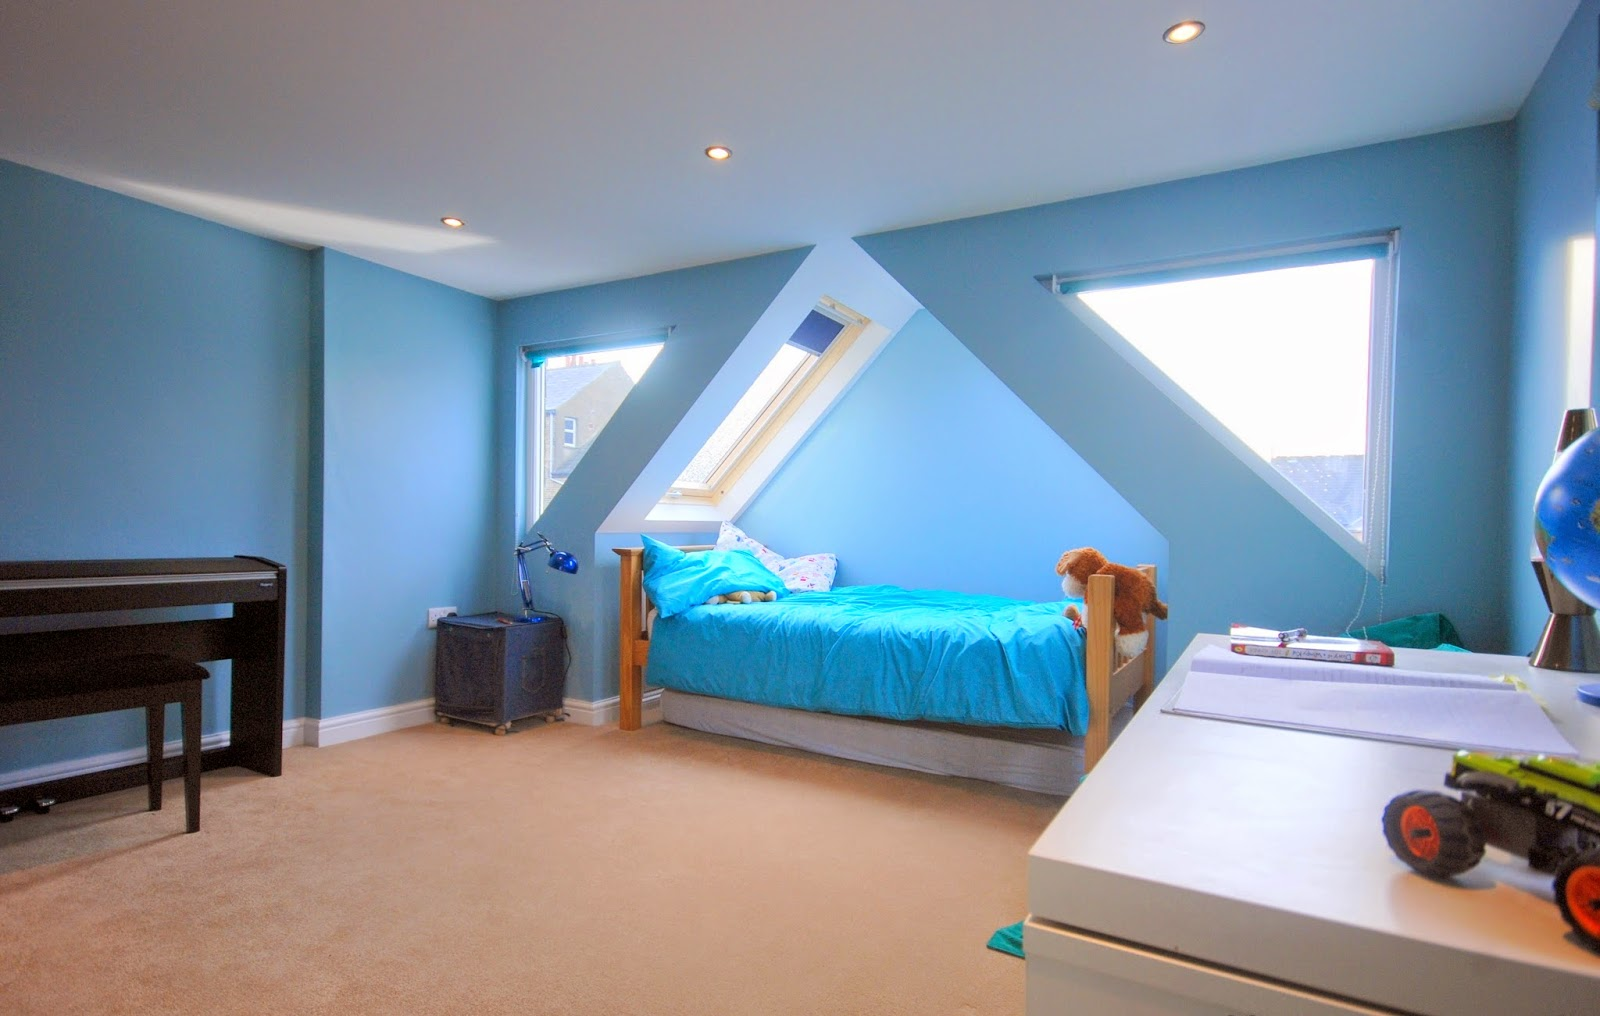 Related : Loft Conversion Bedroom Ideas